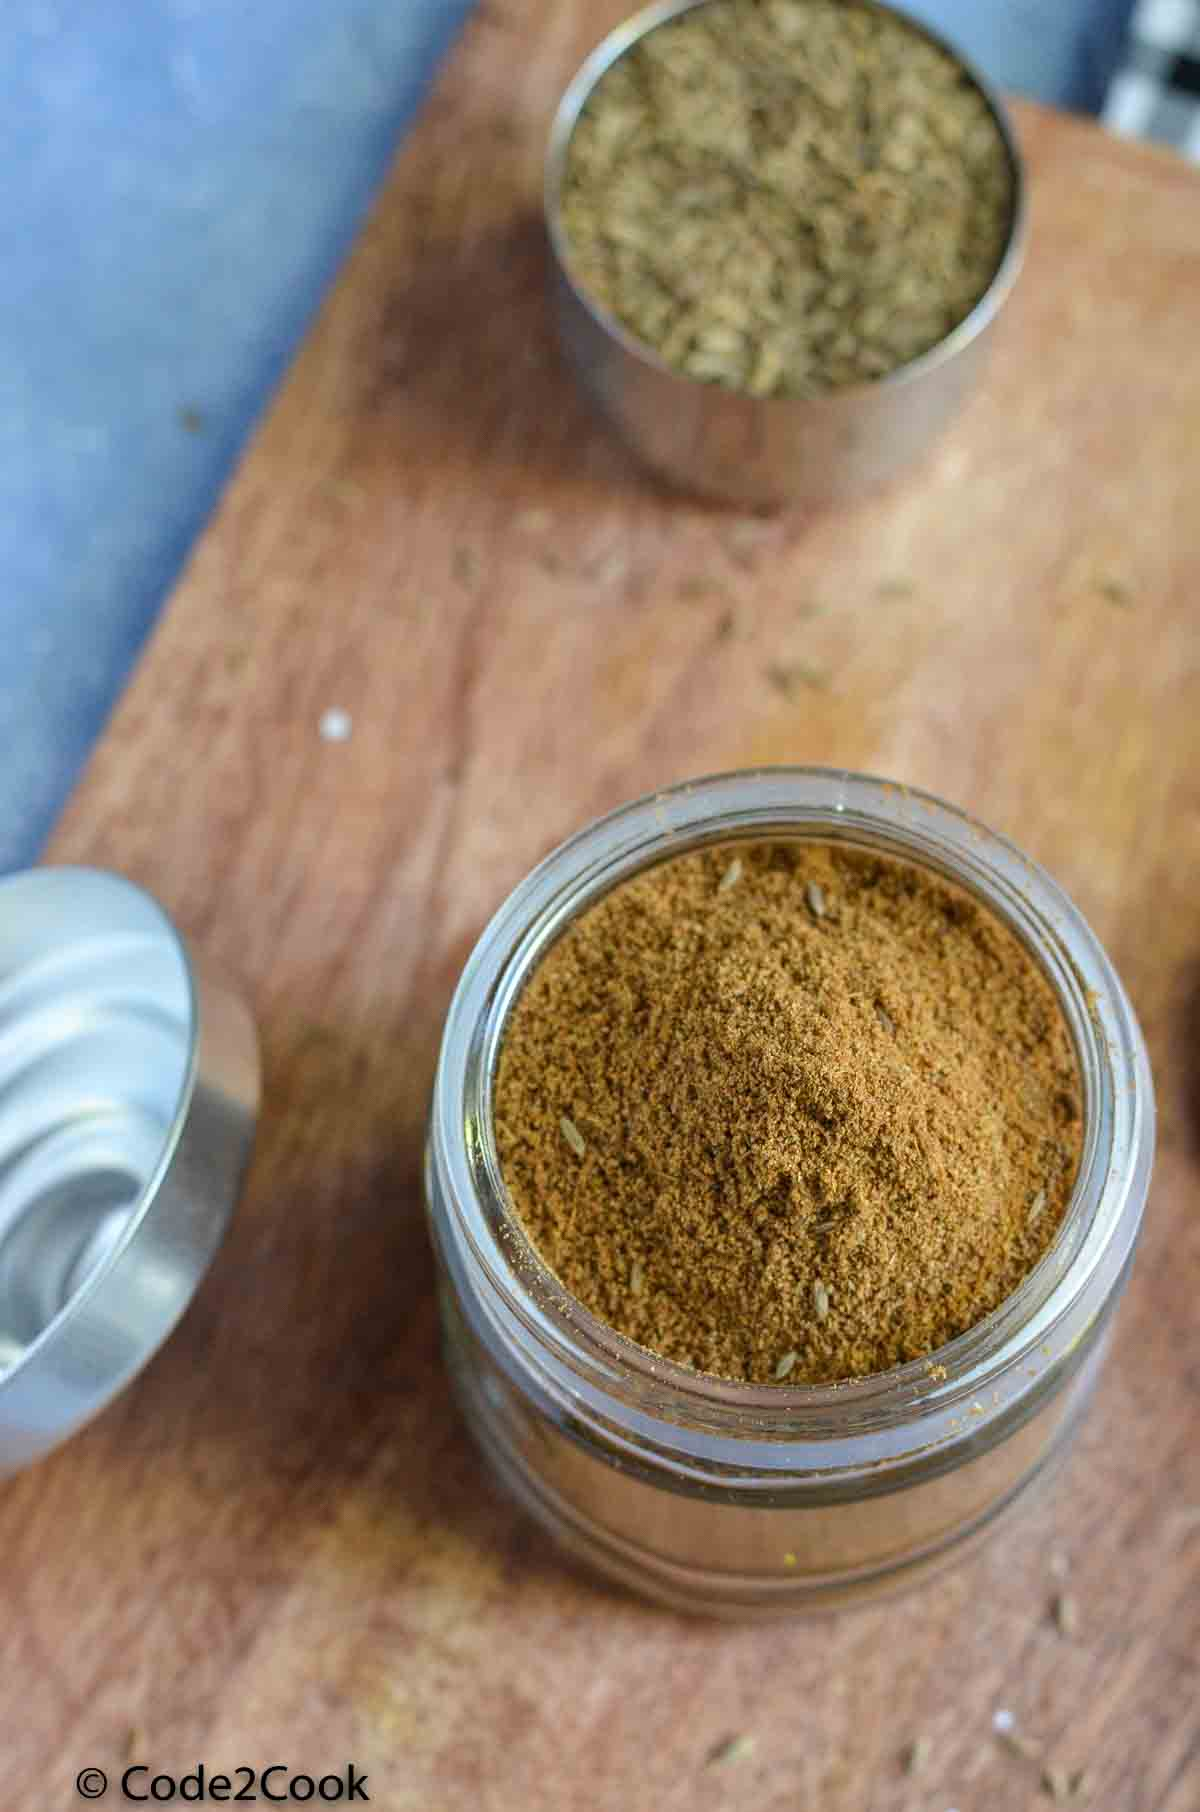 cumin seed powder in a glass jar